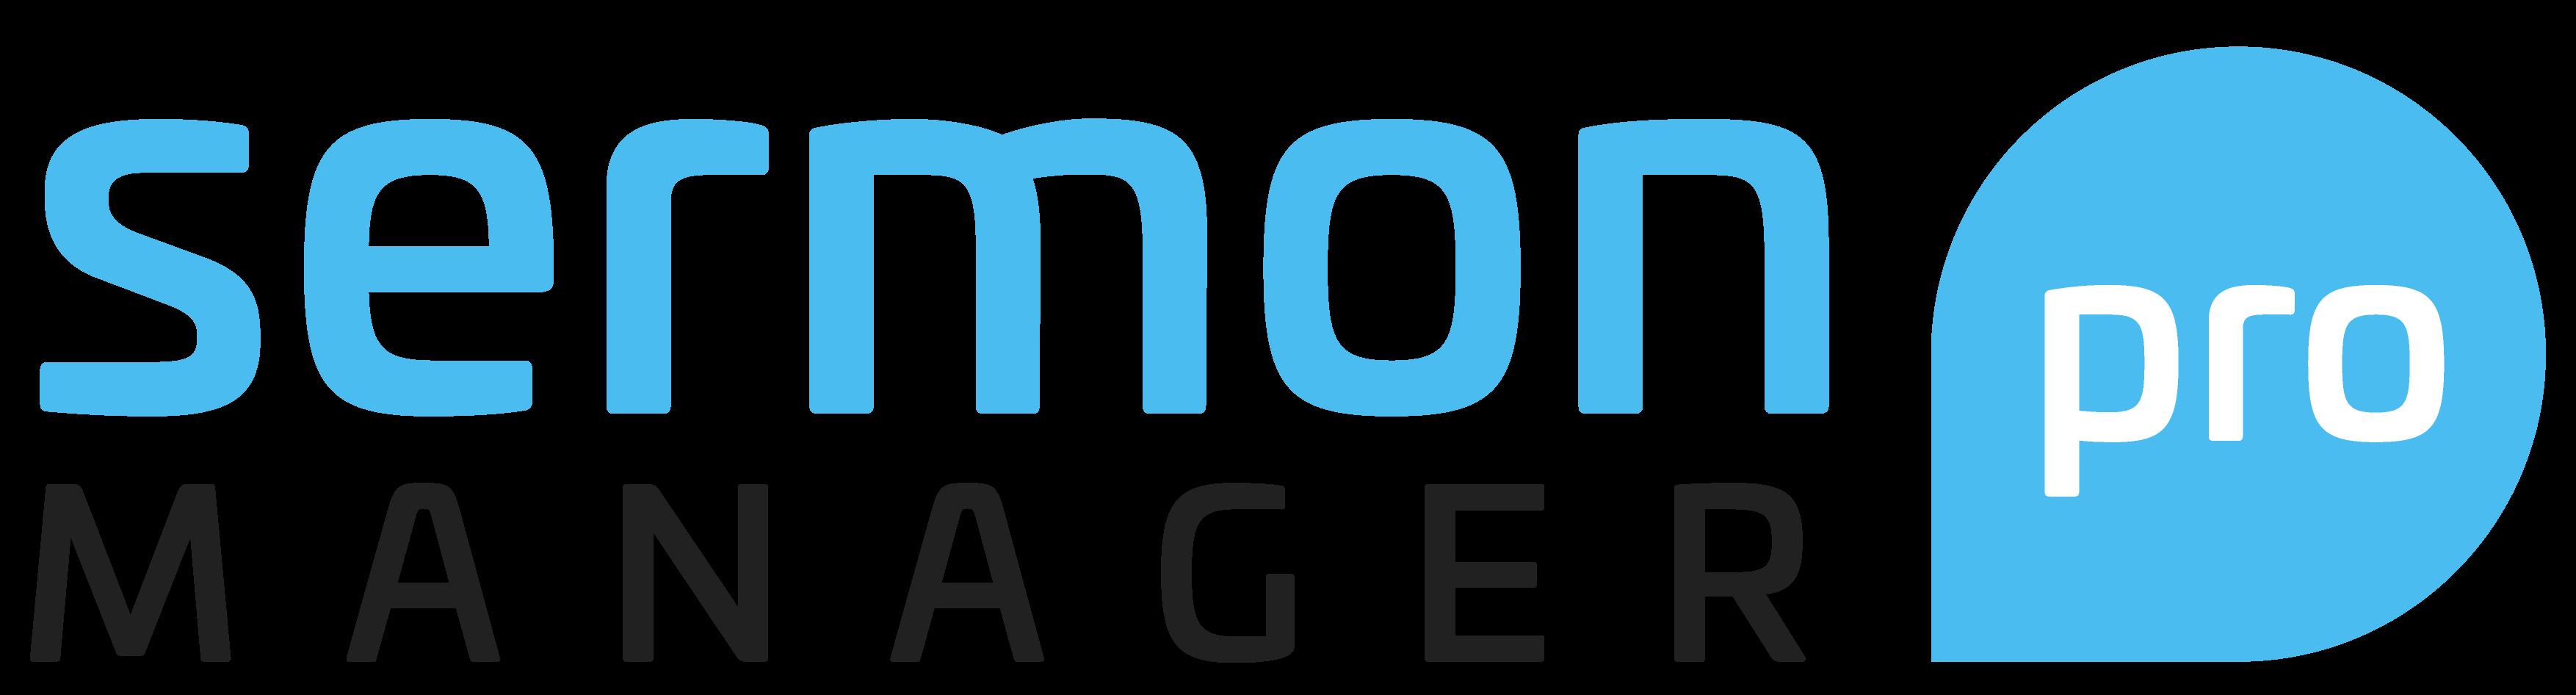 Sermon Manager Pro | #1 Sermon Plugin for WordPress Made Better